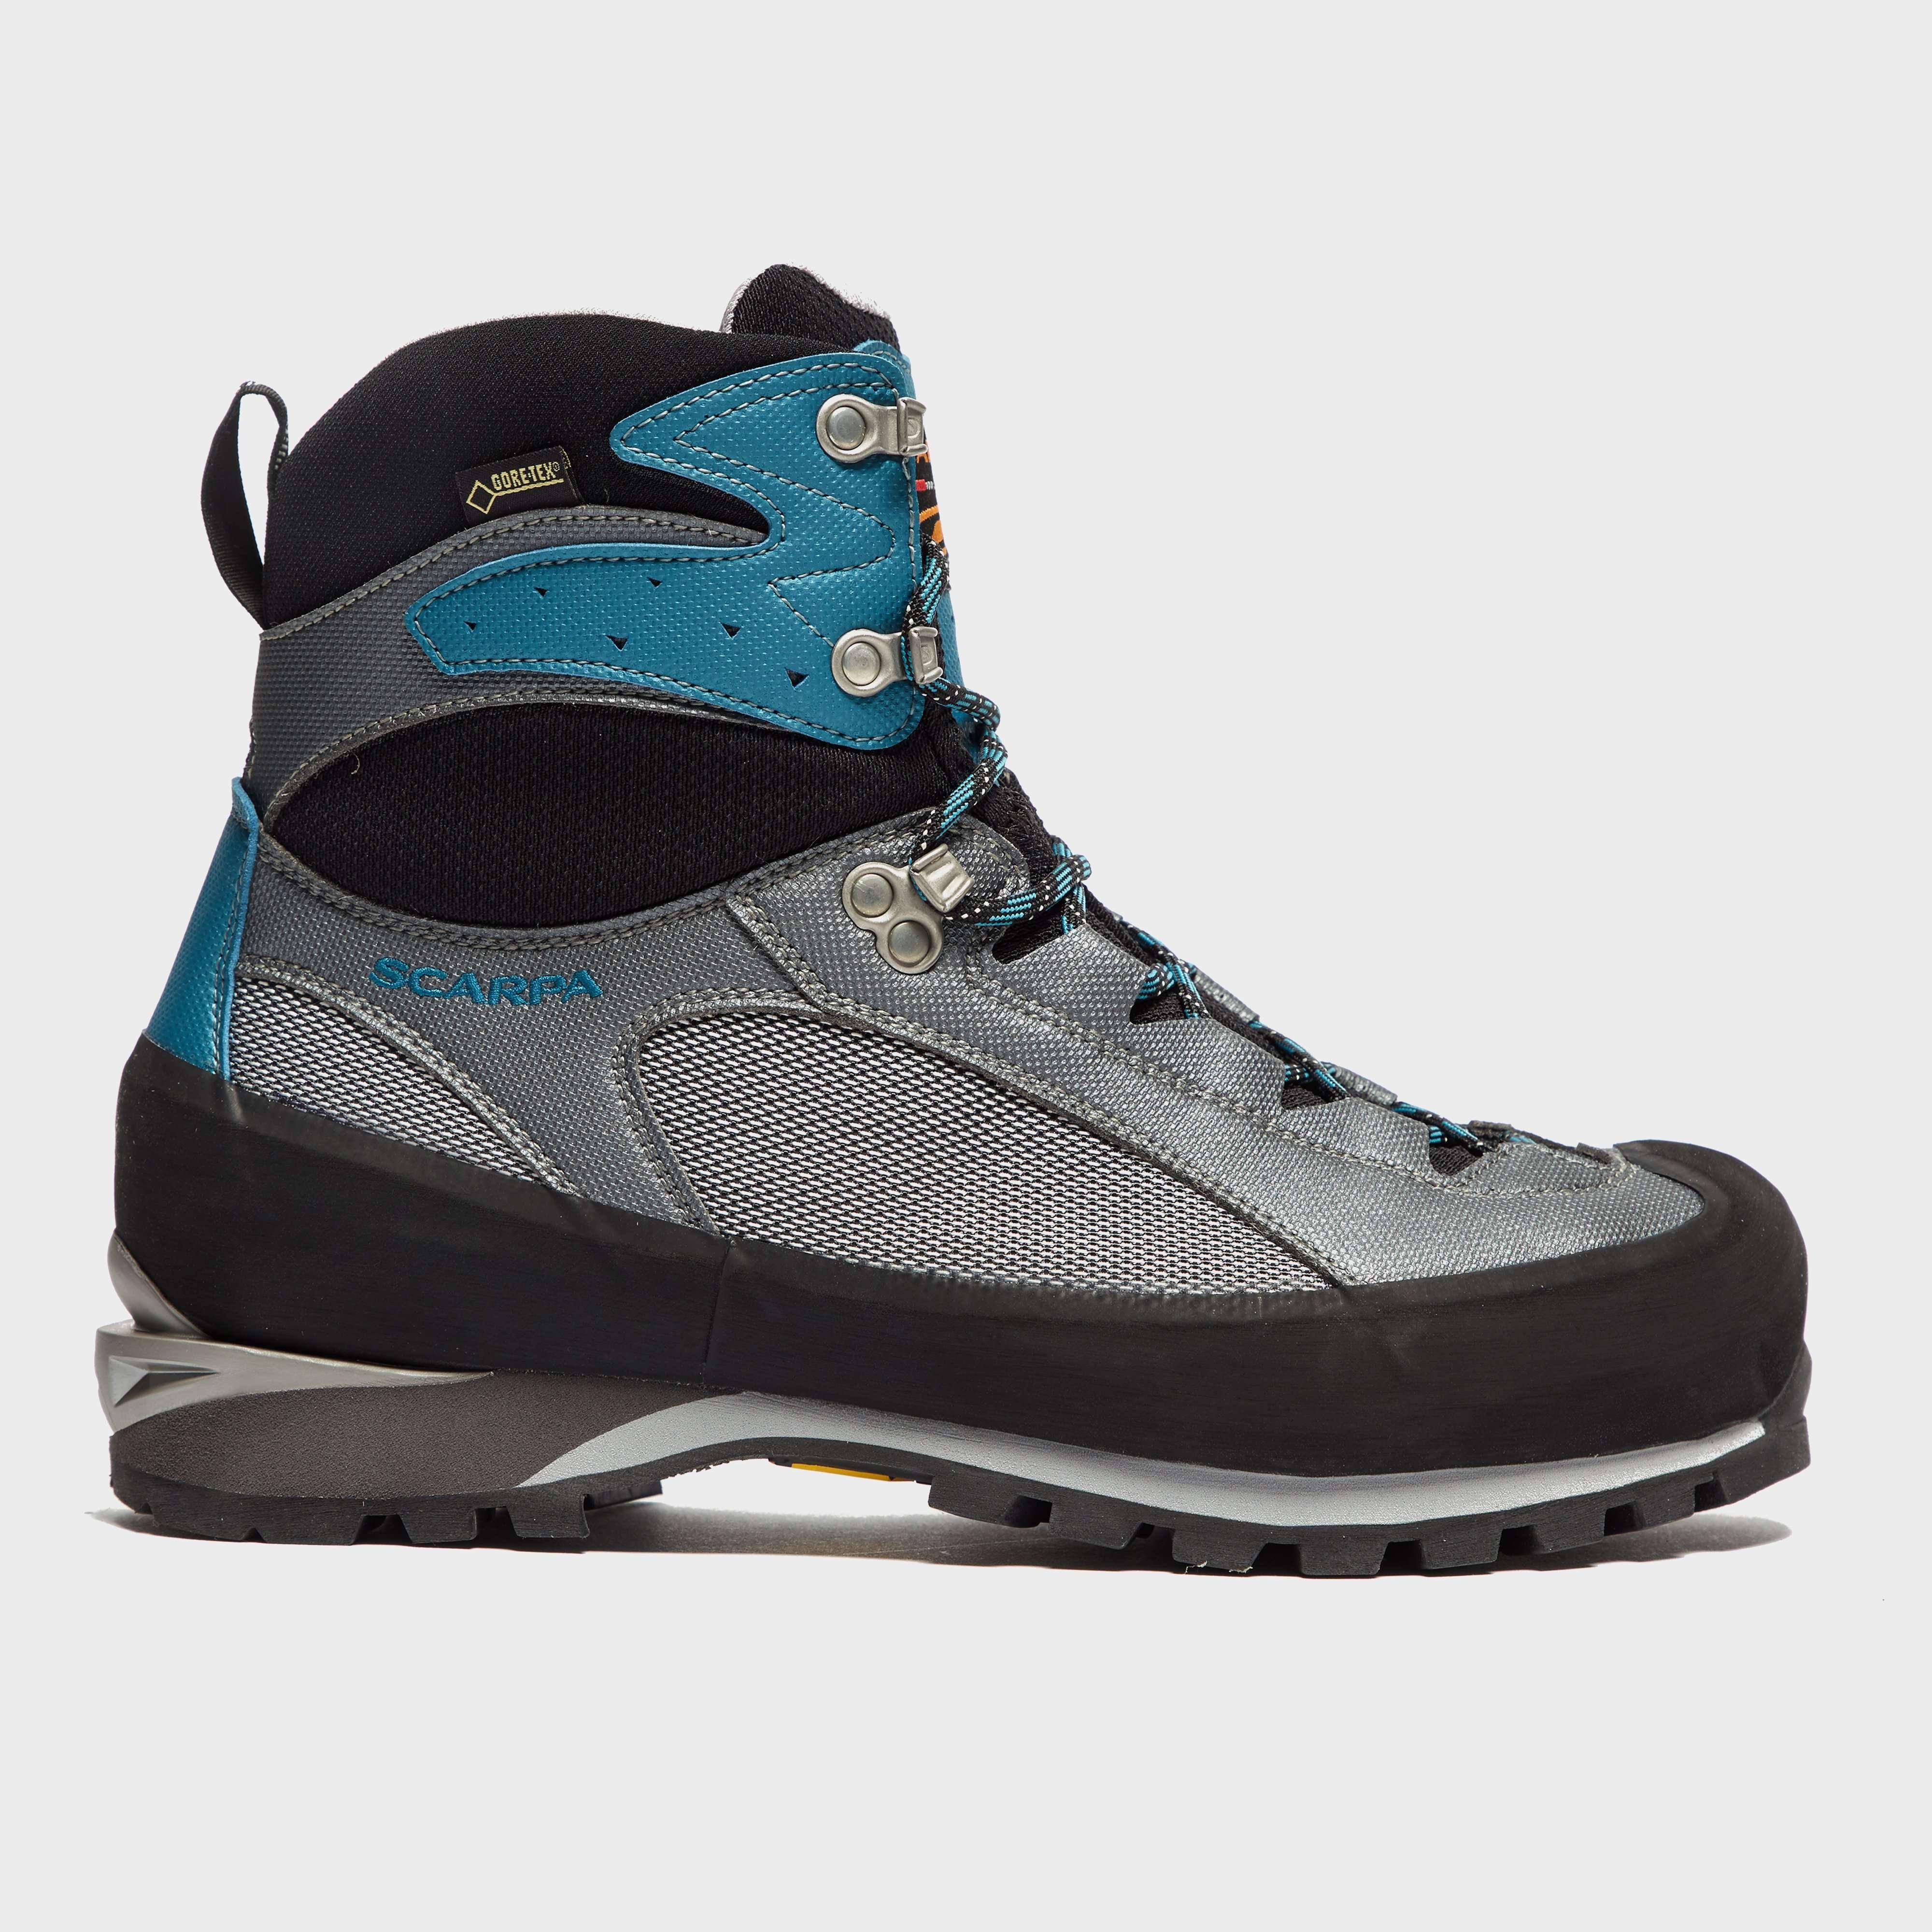 SCARPA Men's Charmoz GORE-TEX® Hiking Boots